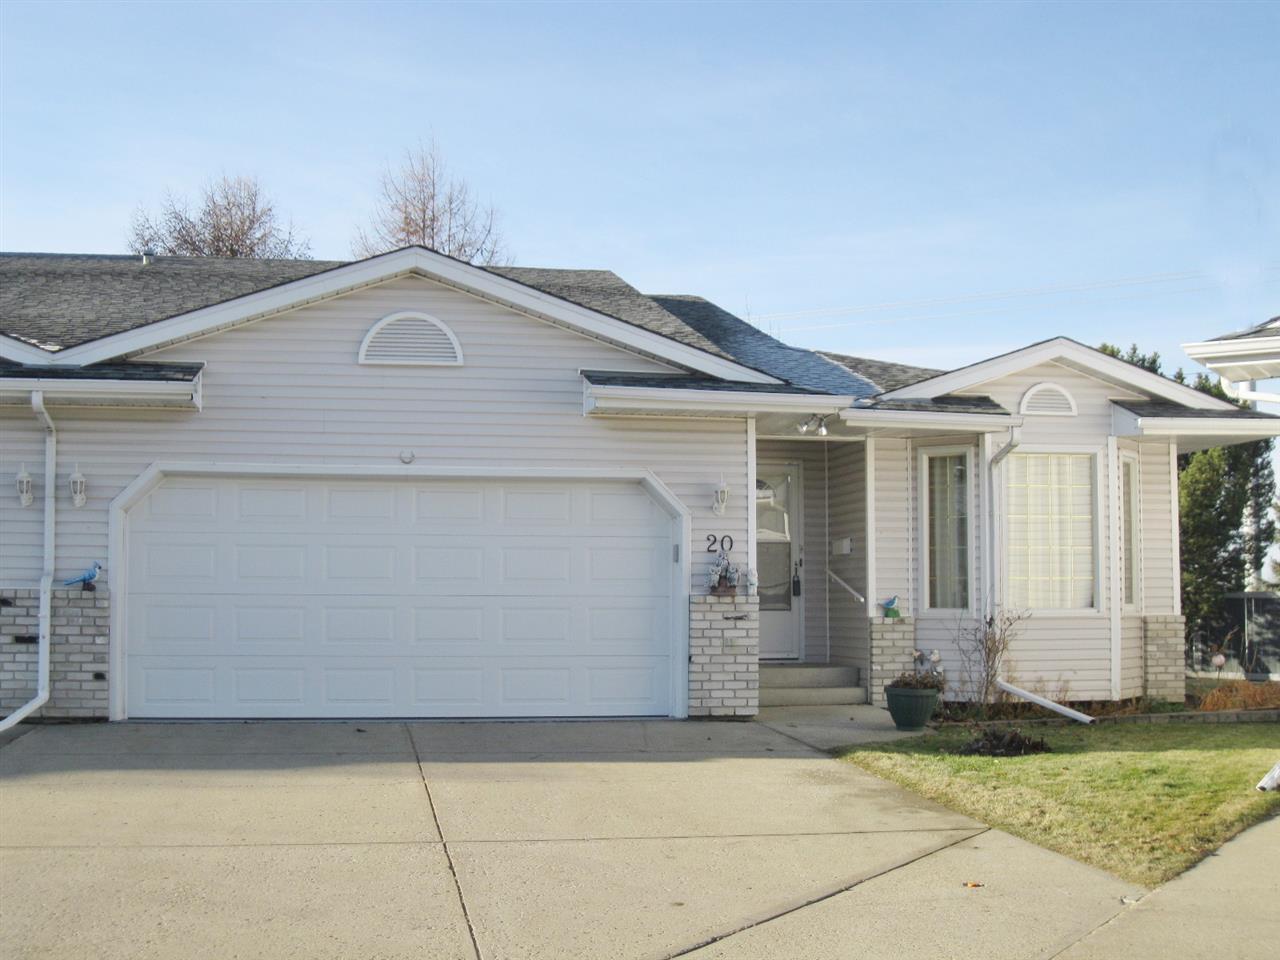 20 2a Fieldstone Drive, Spruce Grove, MLS® # E4163940